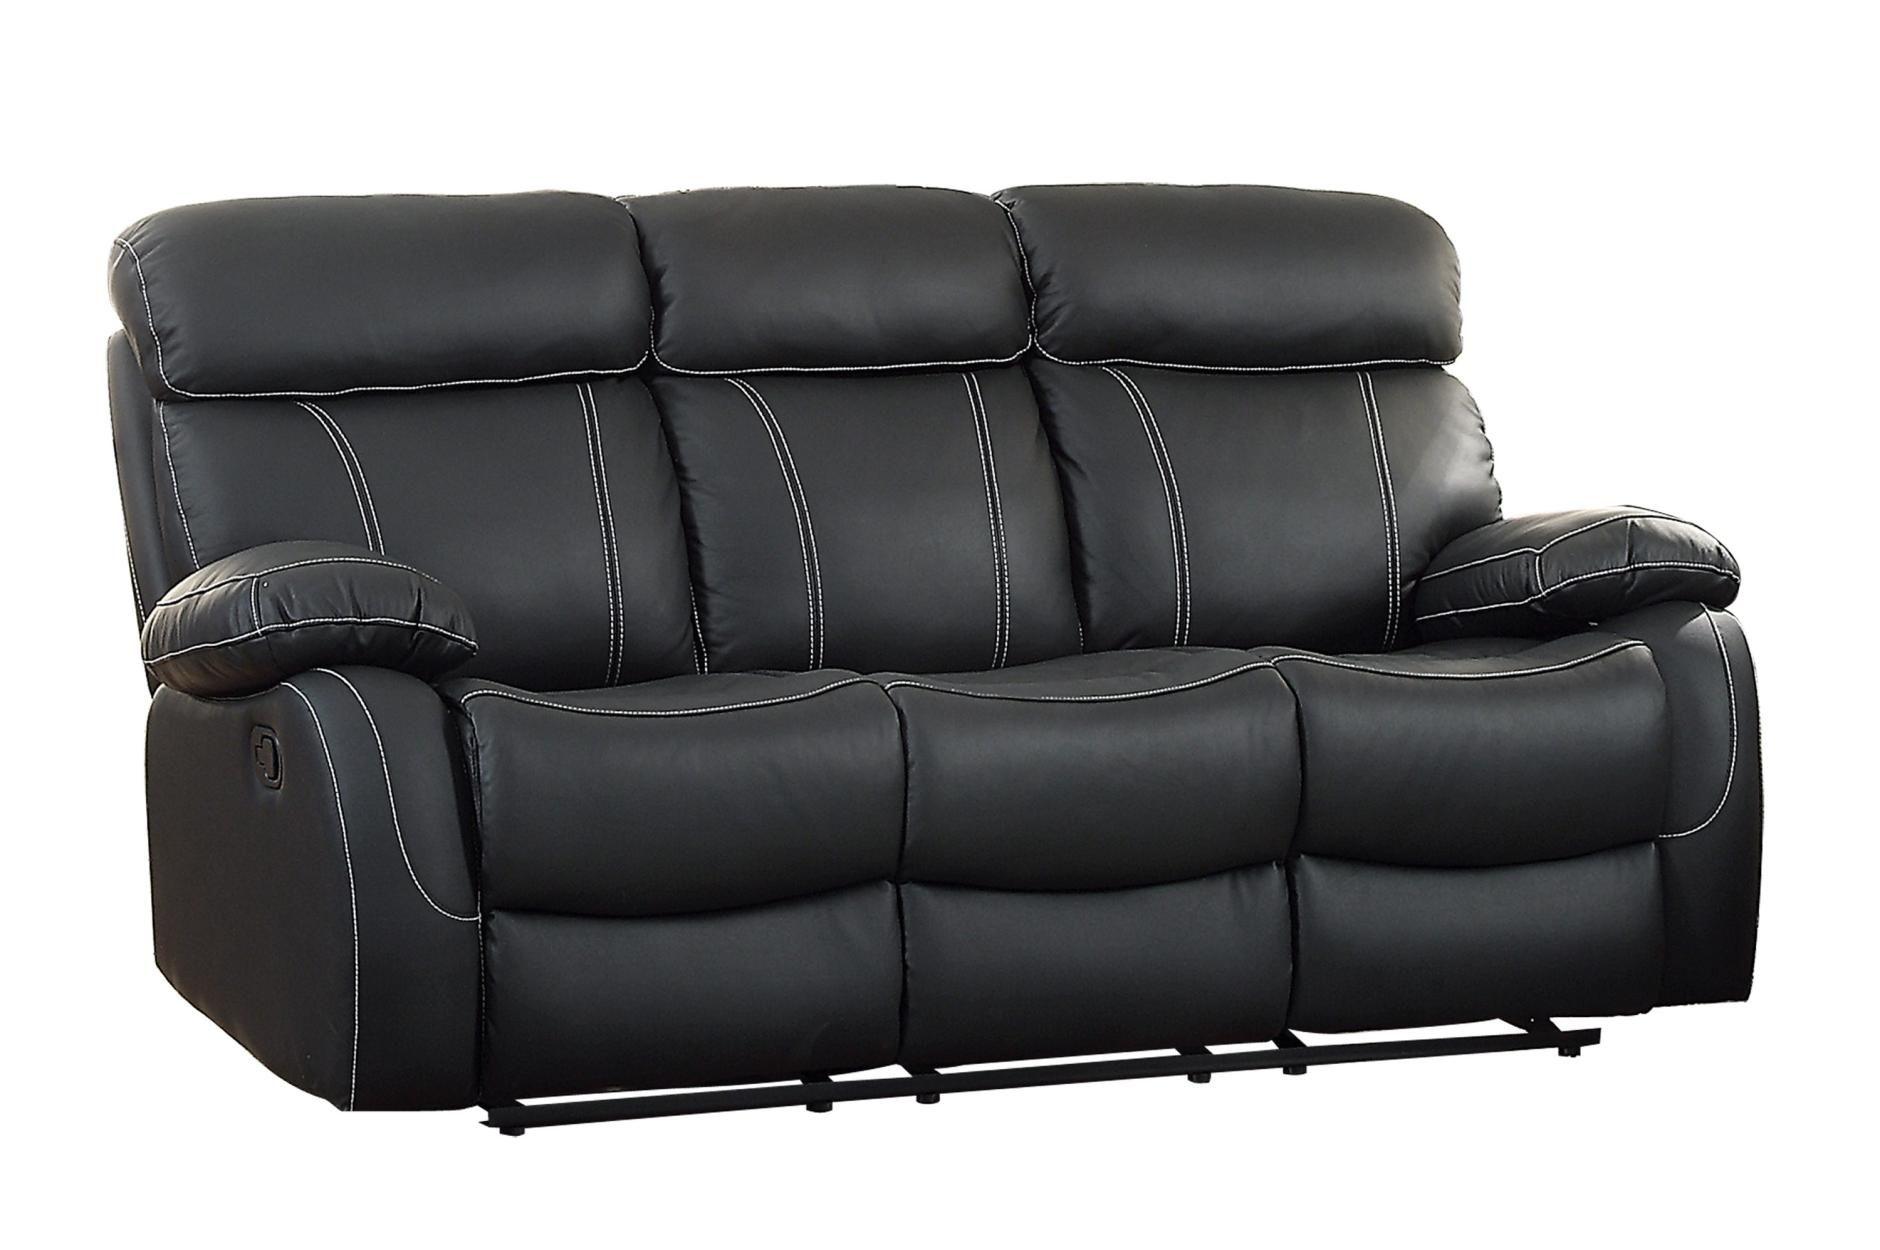 Pendu Leather Leatherette Double Reclining Sofa Reclining Sofa Distressed Leather Sofa Modern Leather Sofa